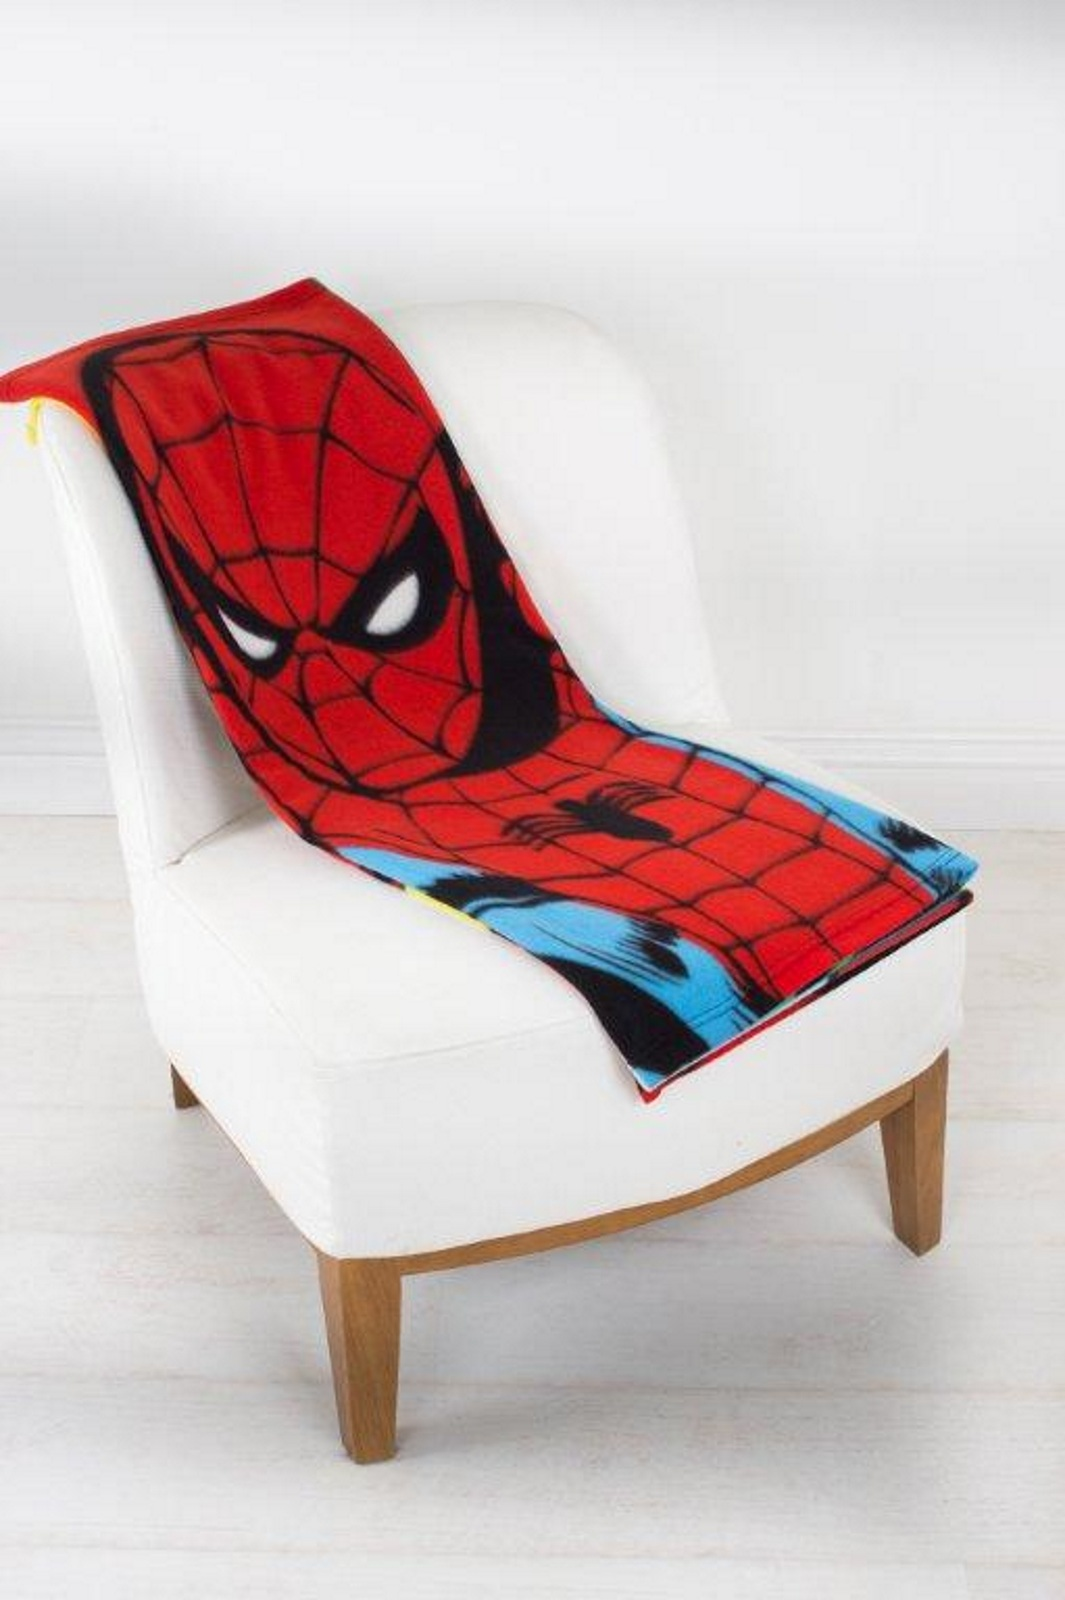 Spiderman 'Identity' Coral Panel Fleece Blanket Throw